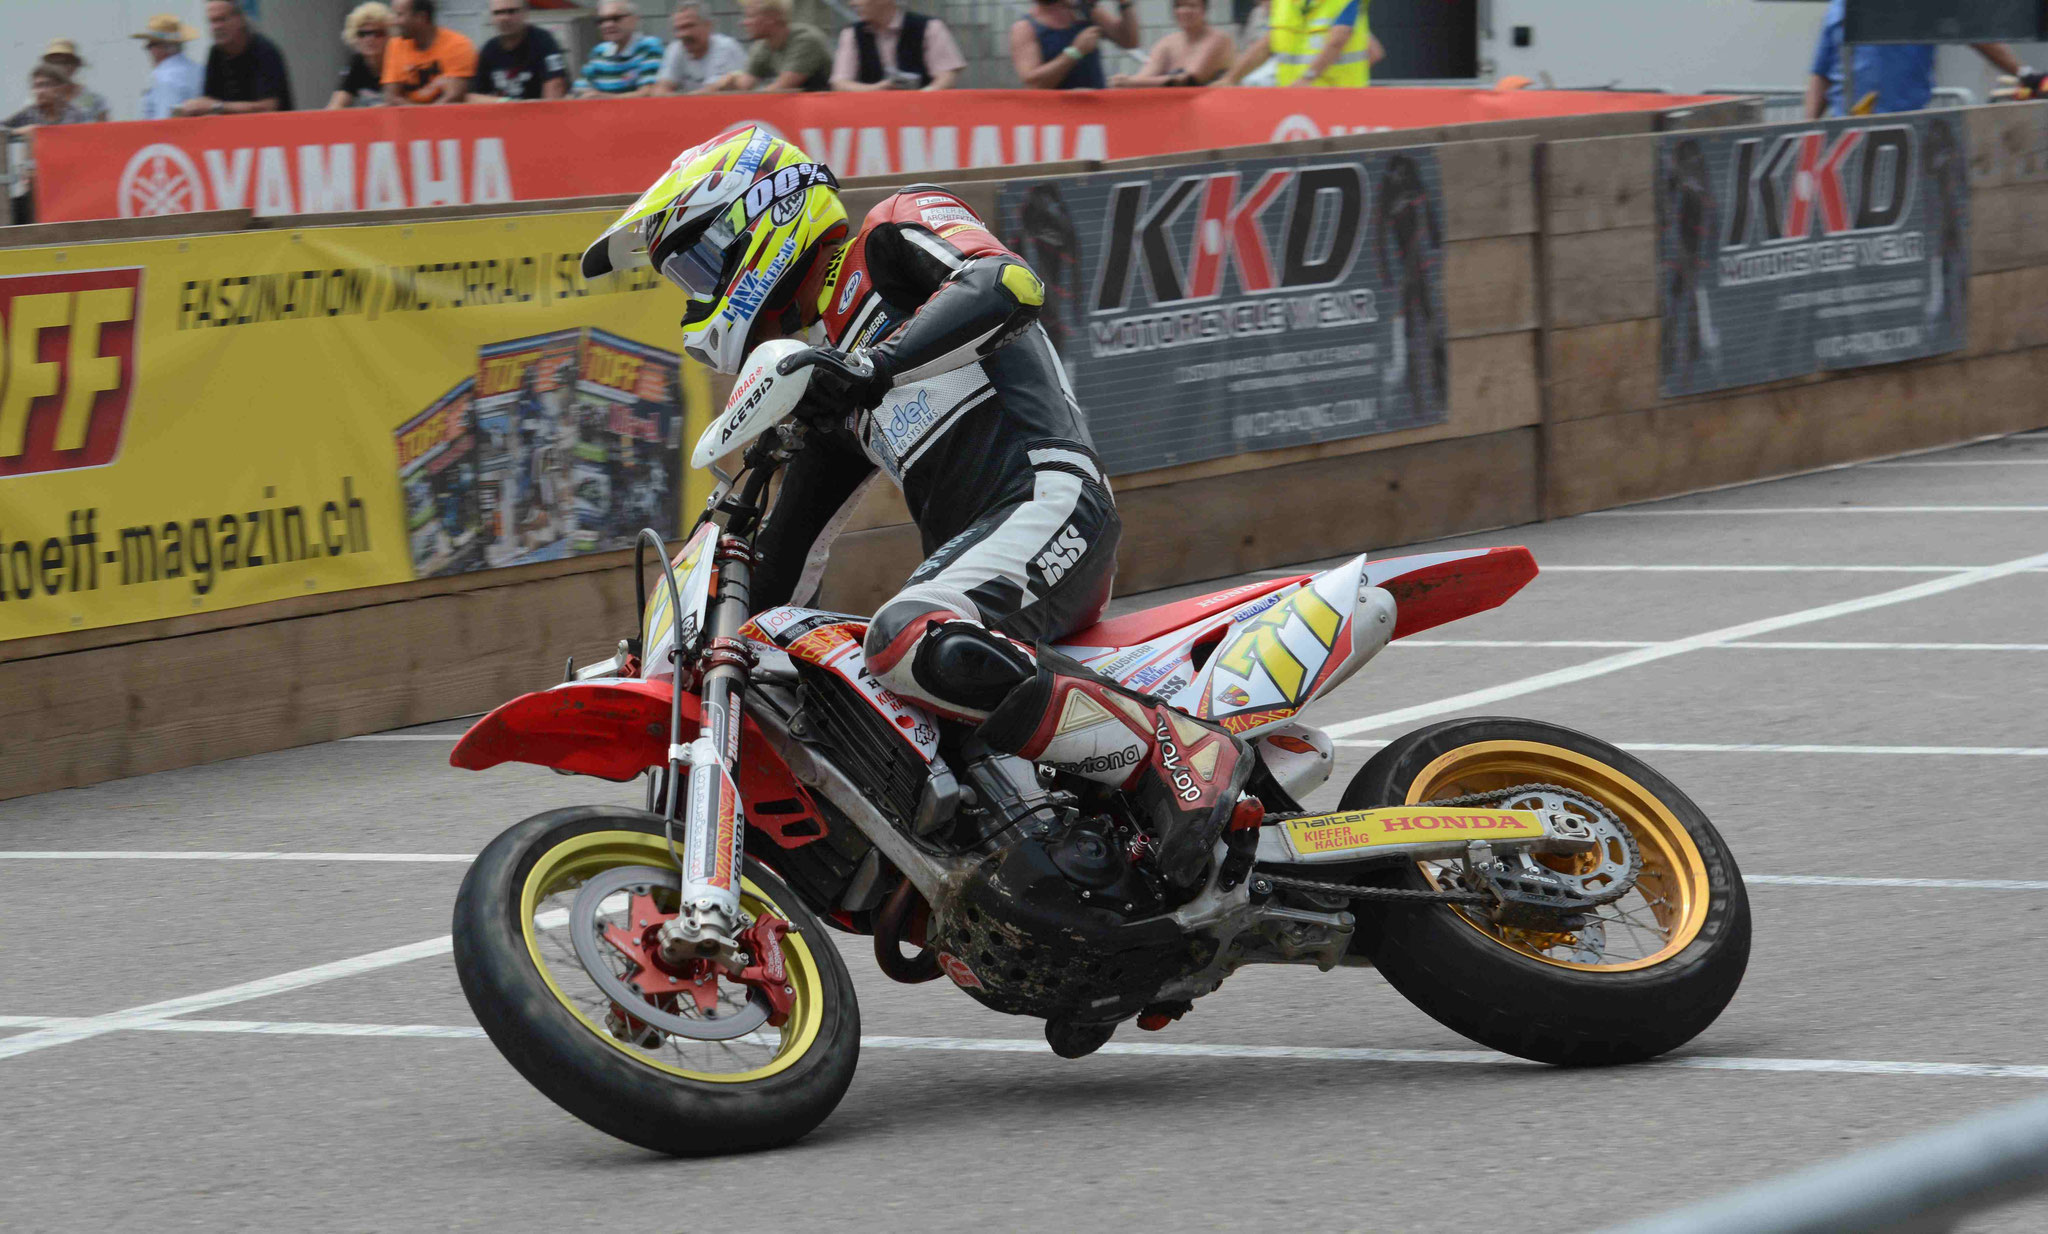 #77 Dominique Aegerter - Honda - Moto2 GP-Fahrer